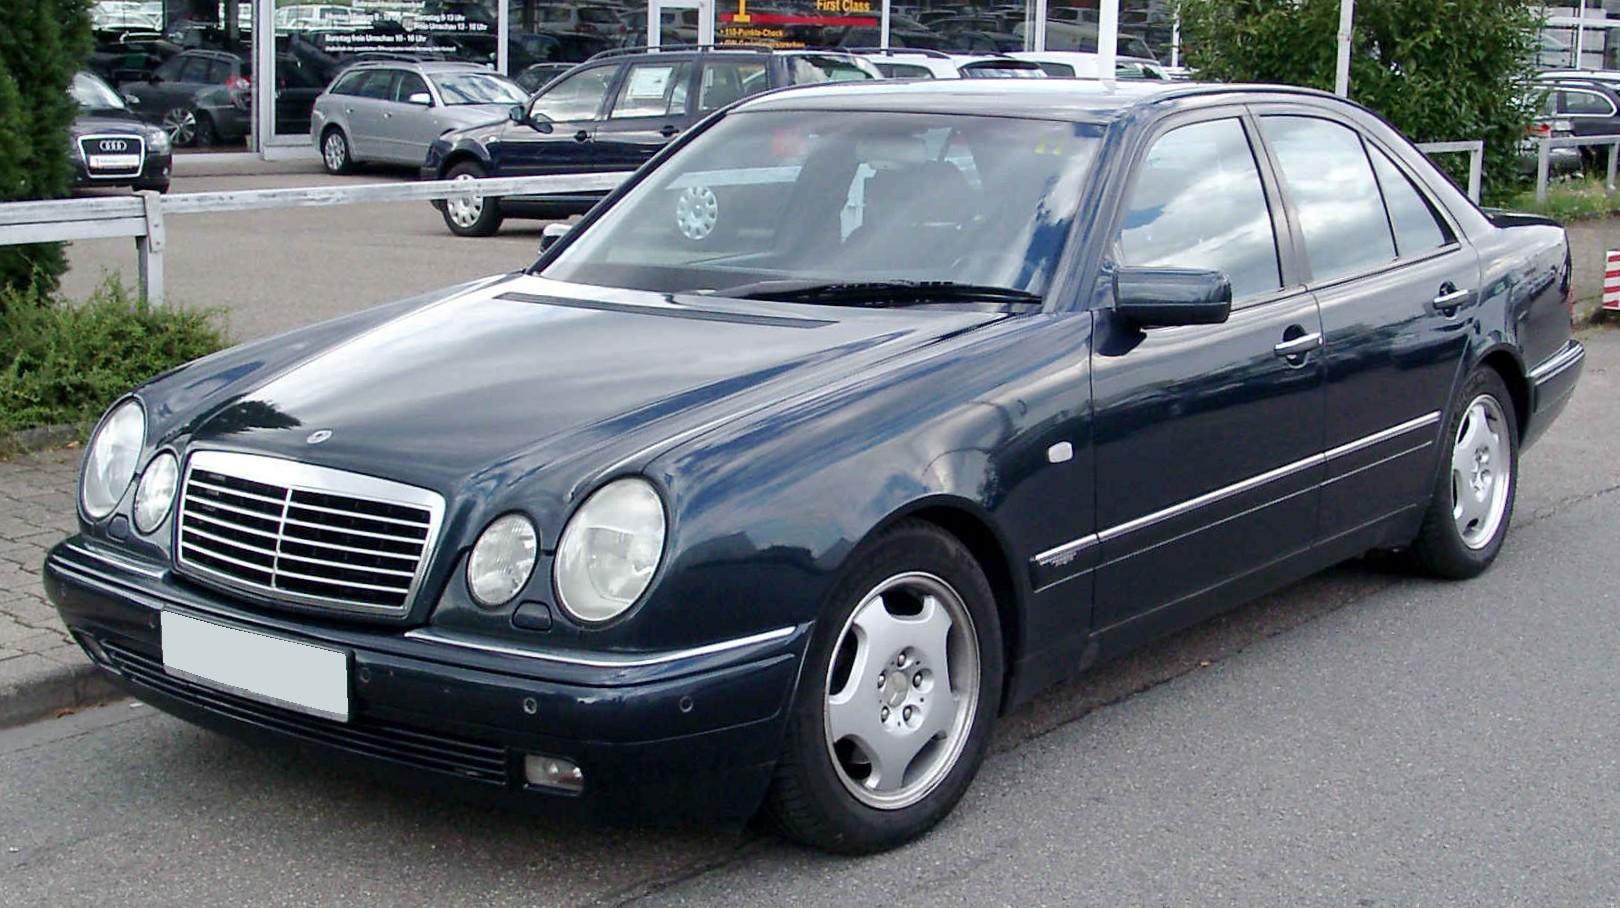 Mercedes-Benz_W210_front_20080809